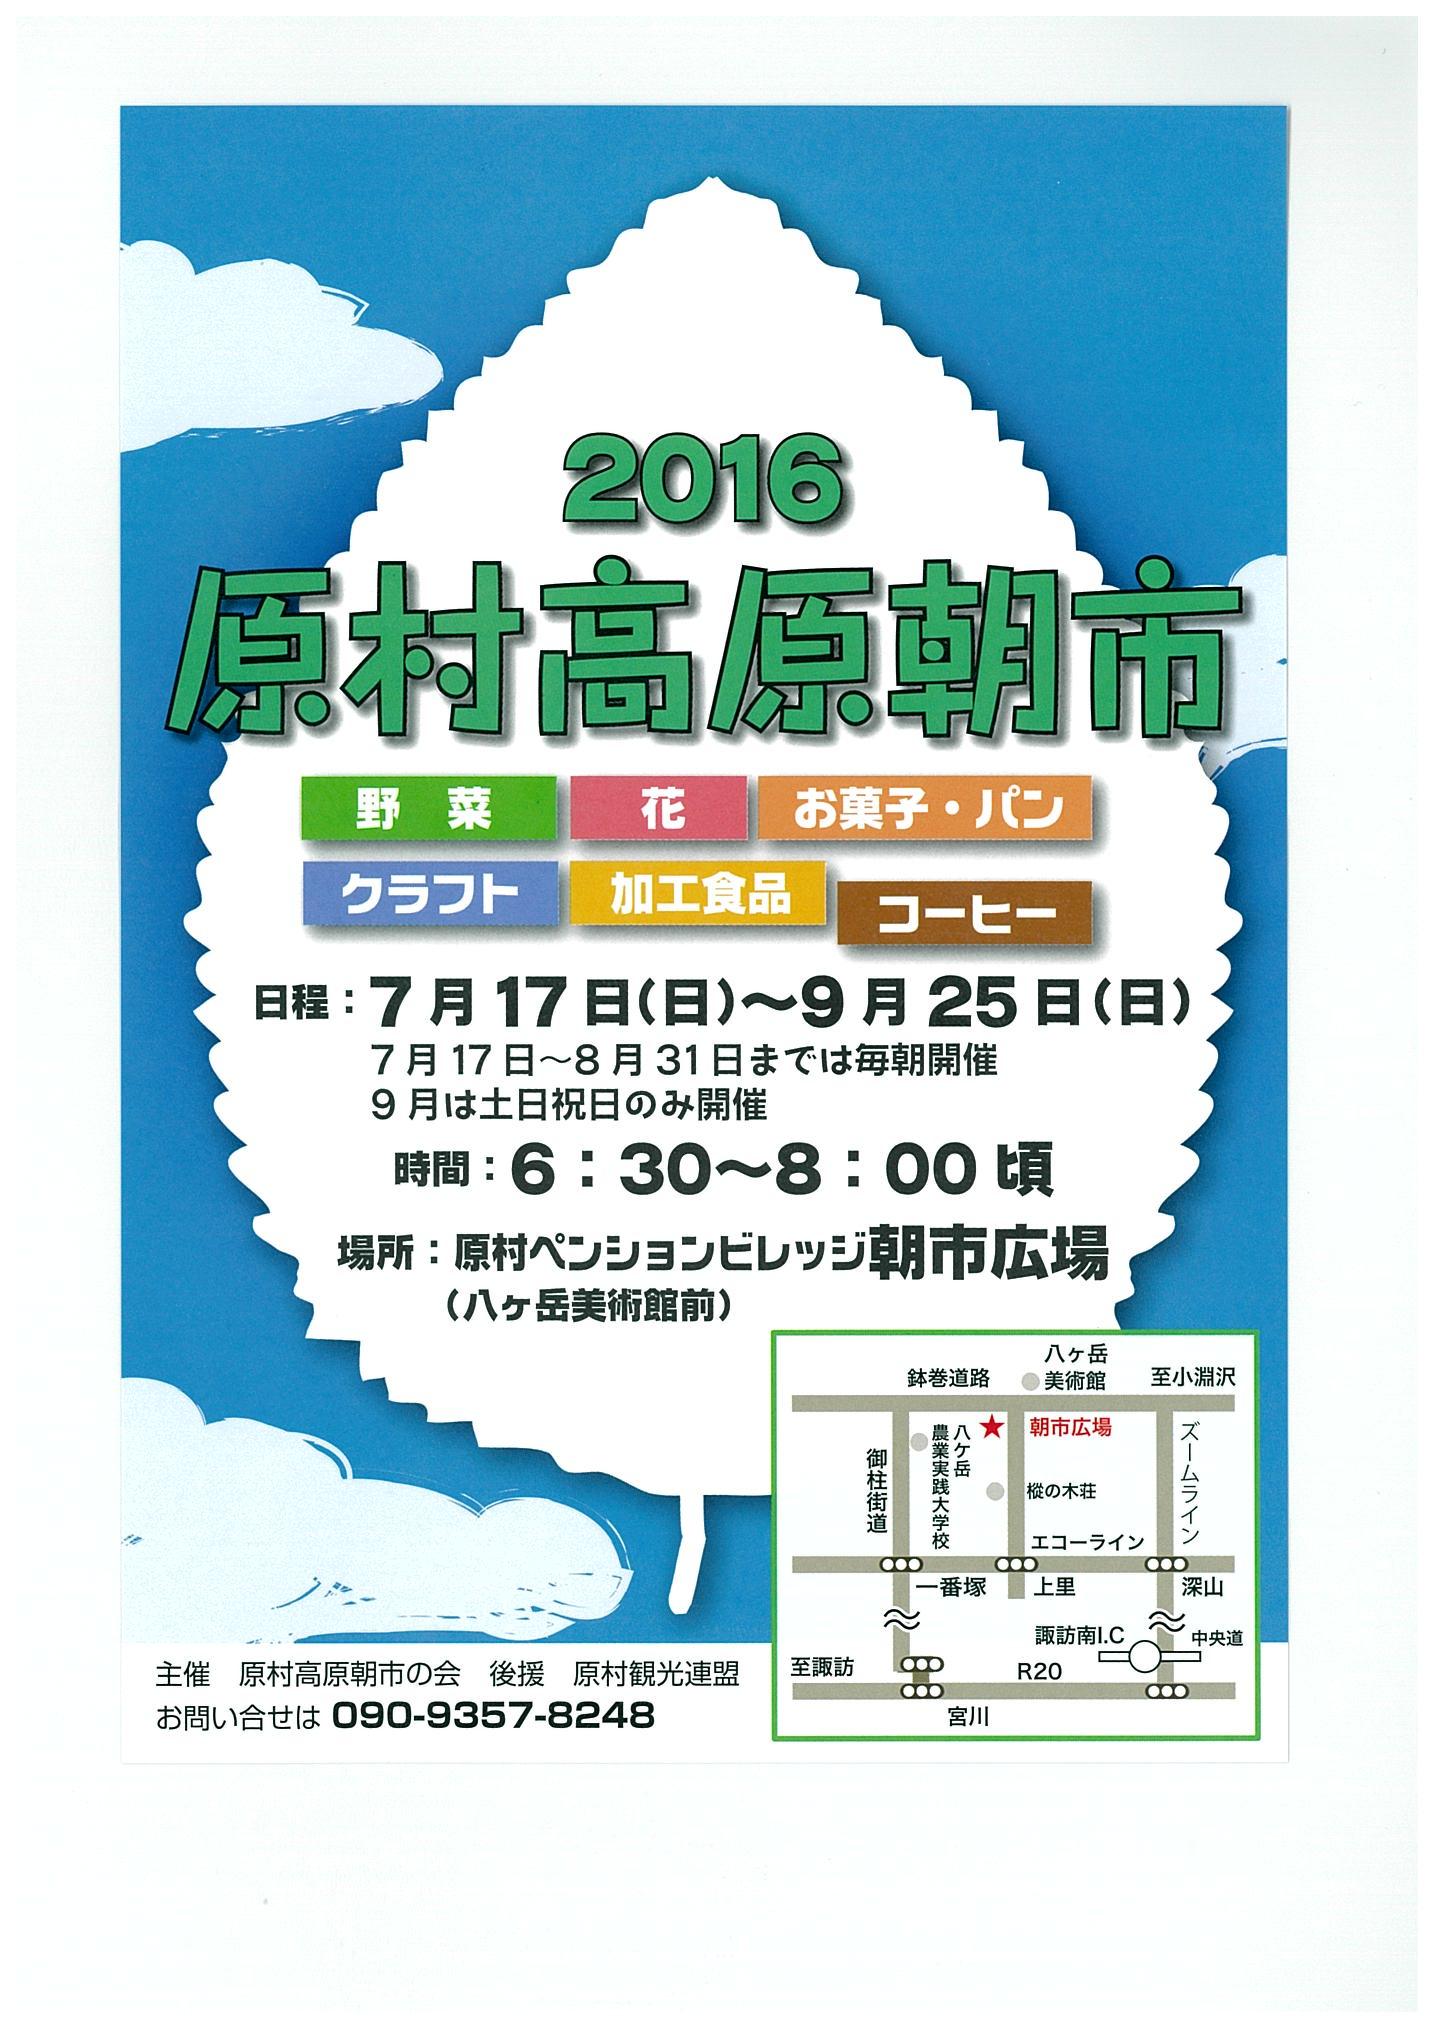 http://www.alpico.co.jp/shikinomori/news/images/20160704114013-0001.jpg